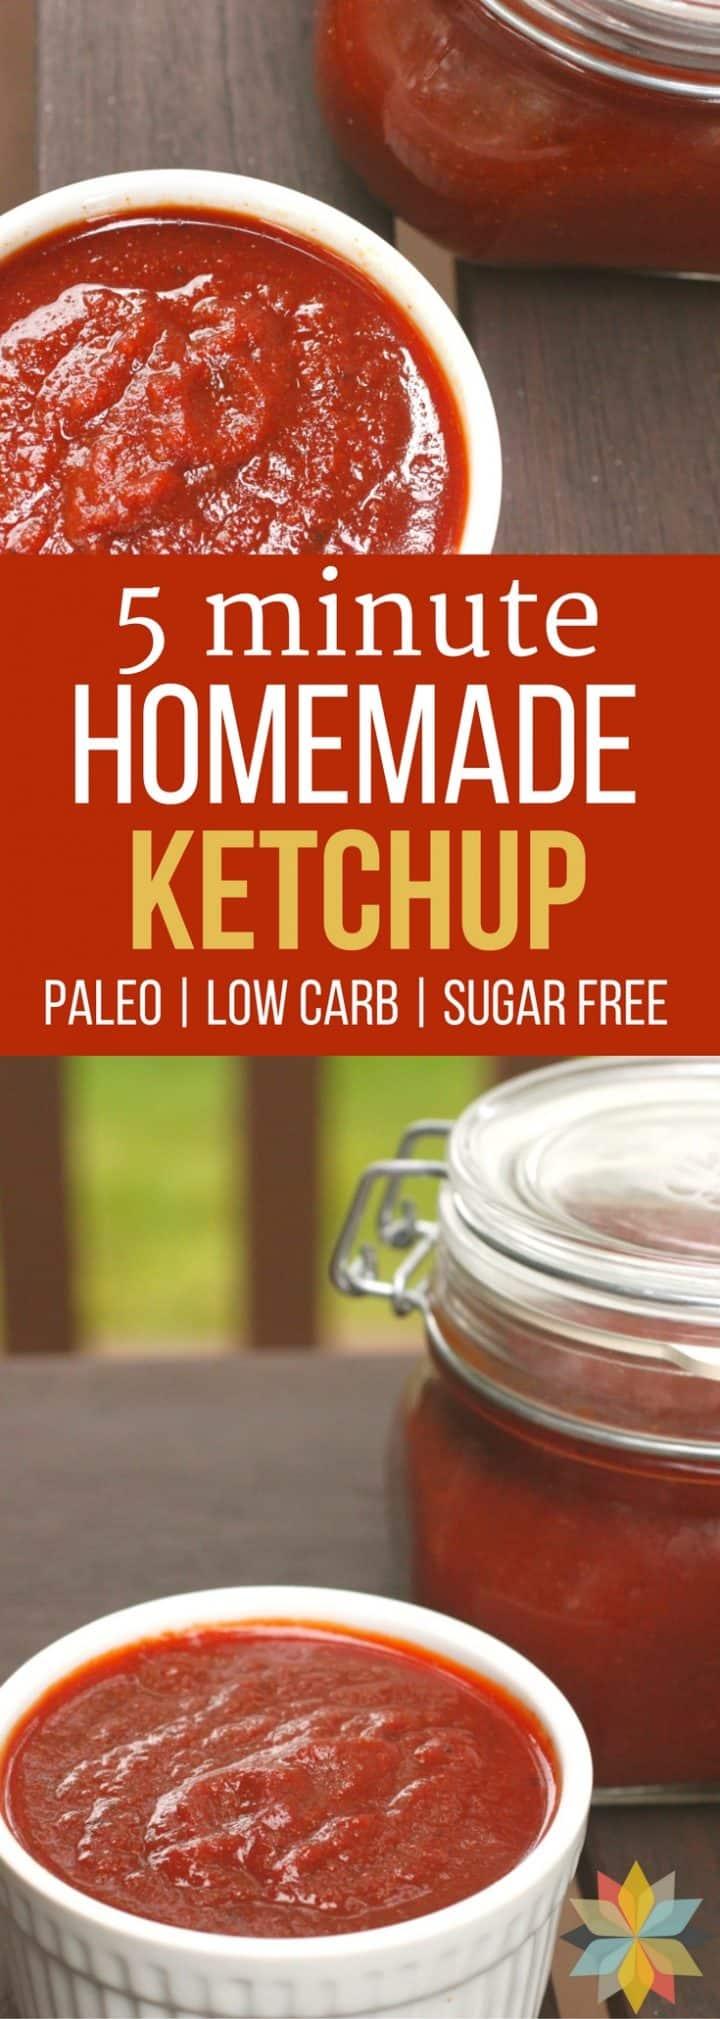 Easy Homemade Ketchup Recipe